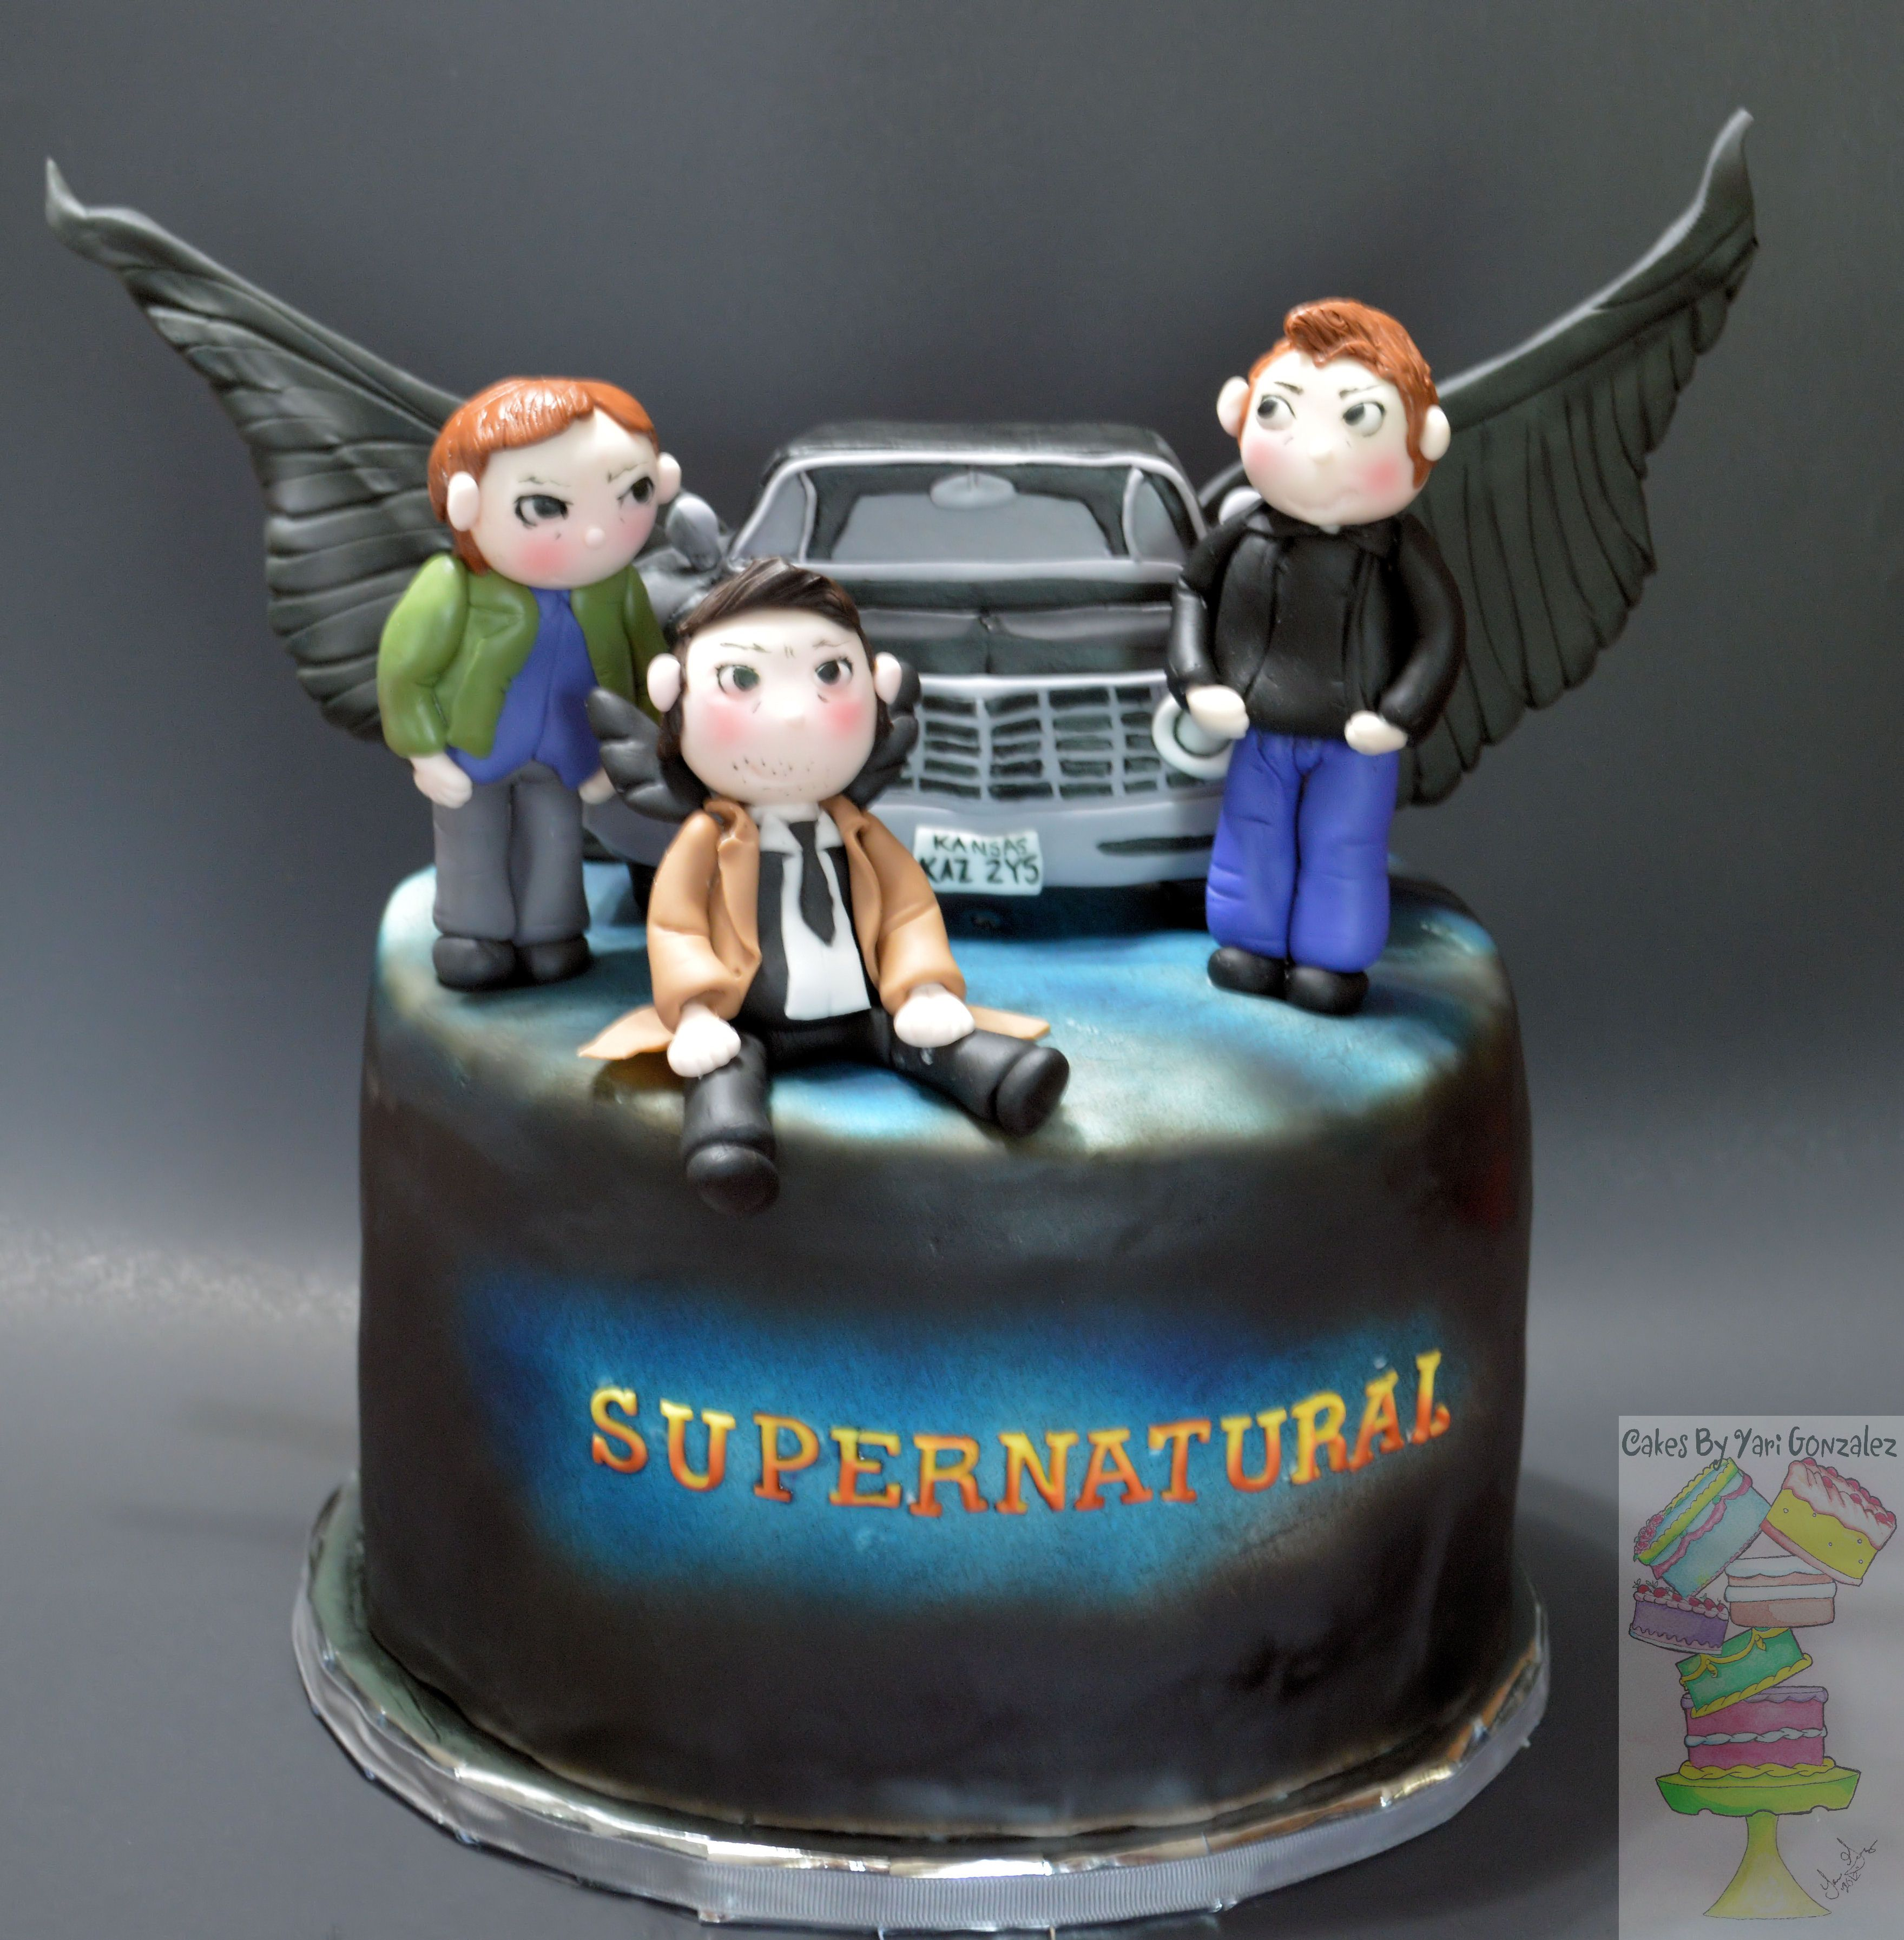 supernatural cake cake by yari gonzalez wwwfacebookcom